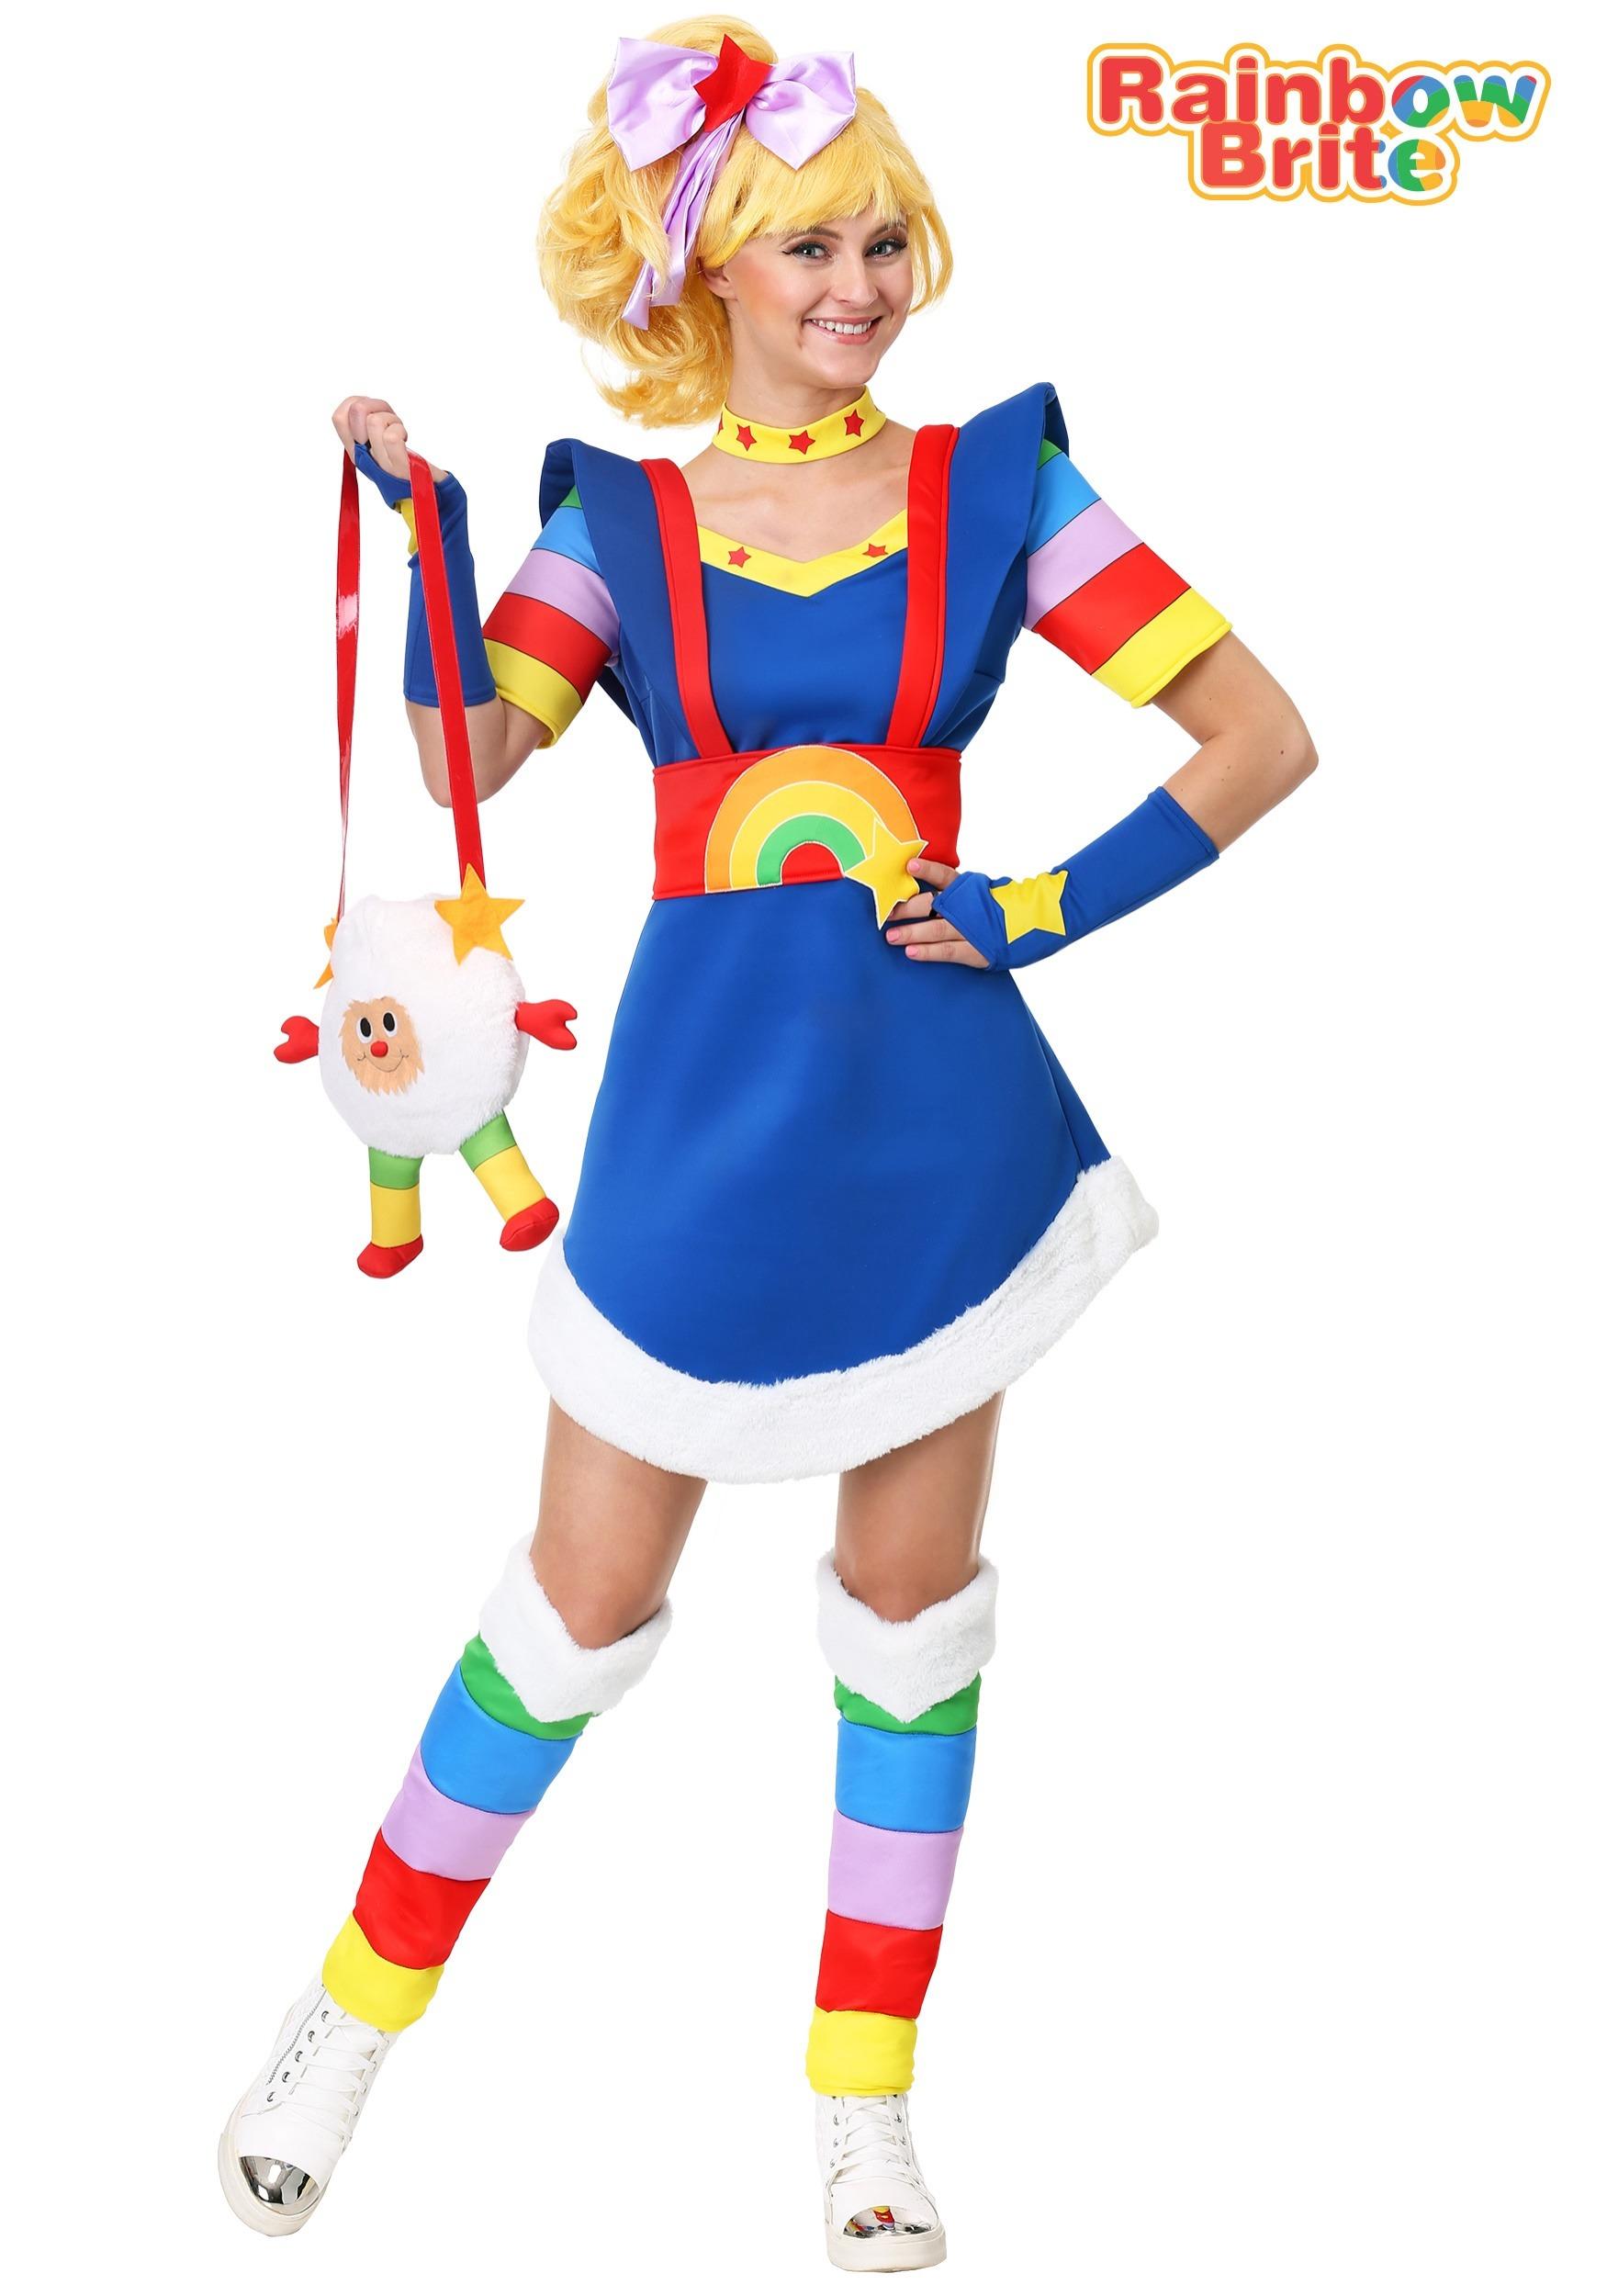 3e32b97198daf Rainbow Brite Women s Plus Size Costume 1X 2X 3X